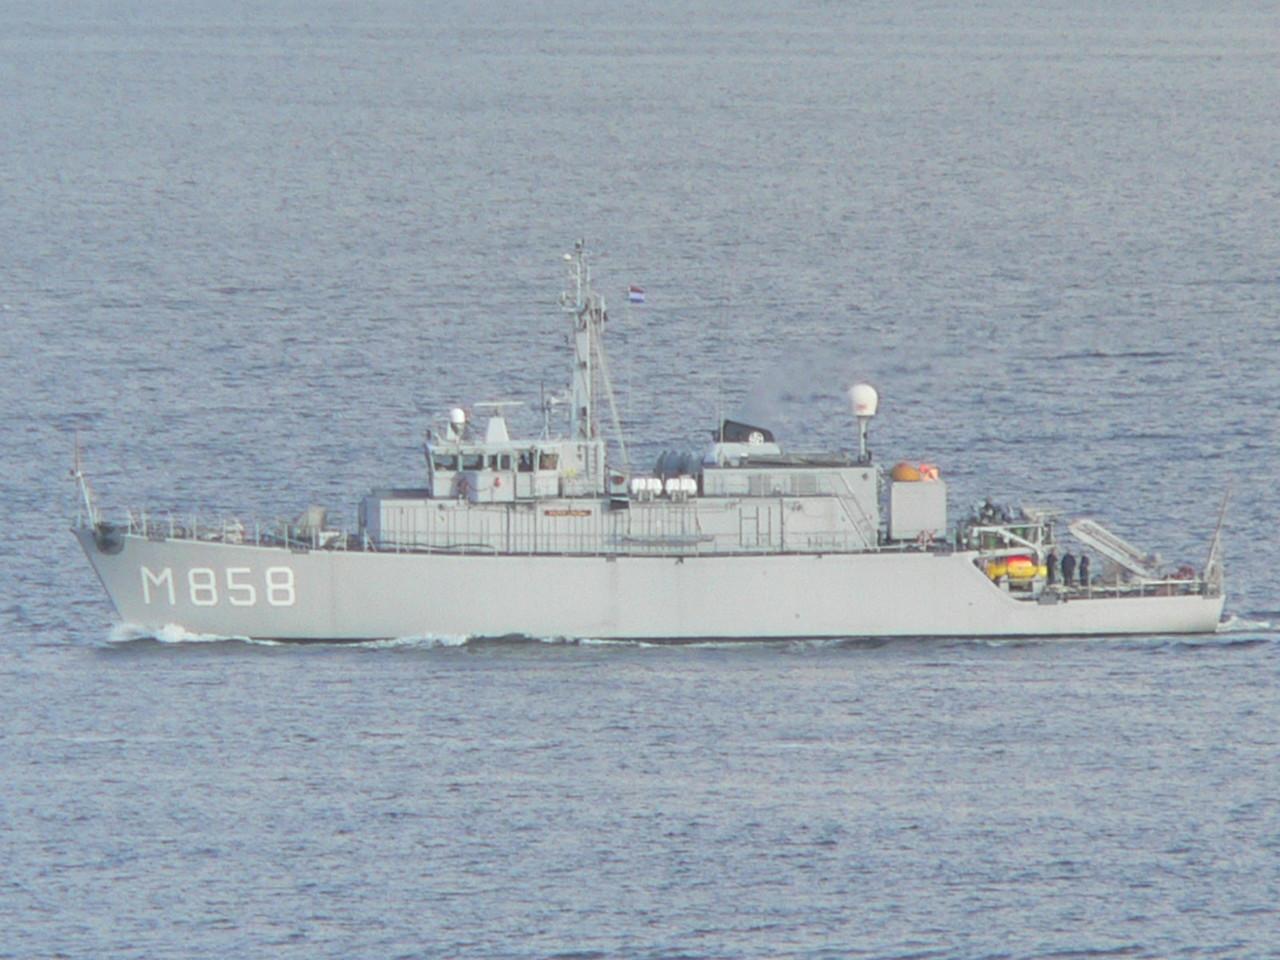 M-858 HrMs MIDDELBURG